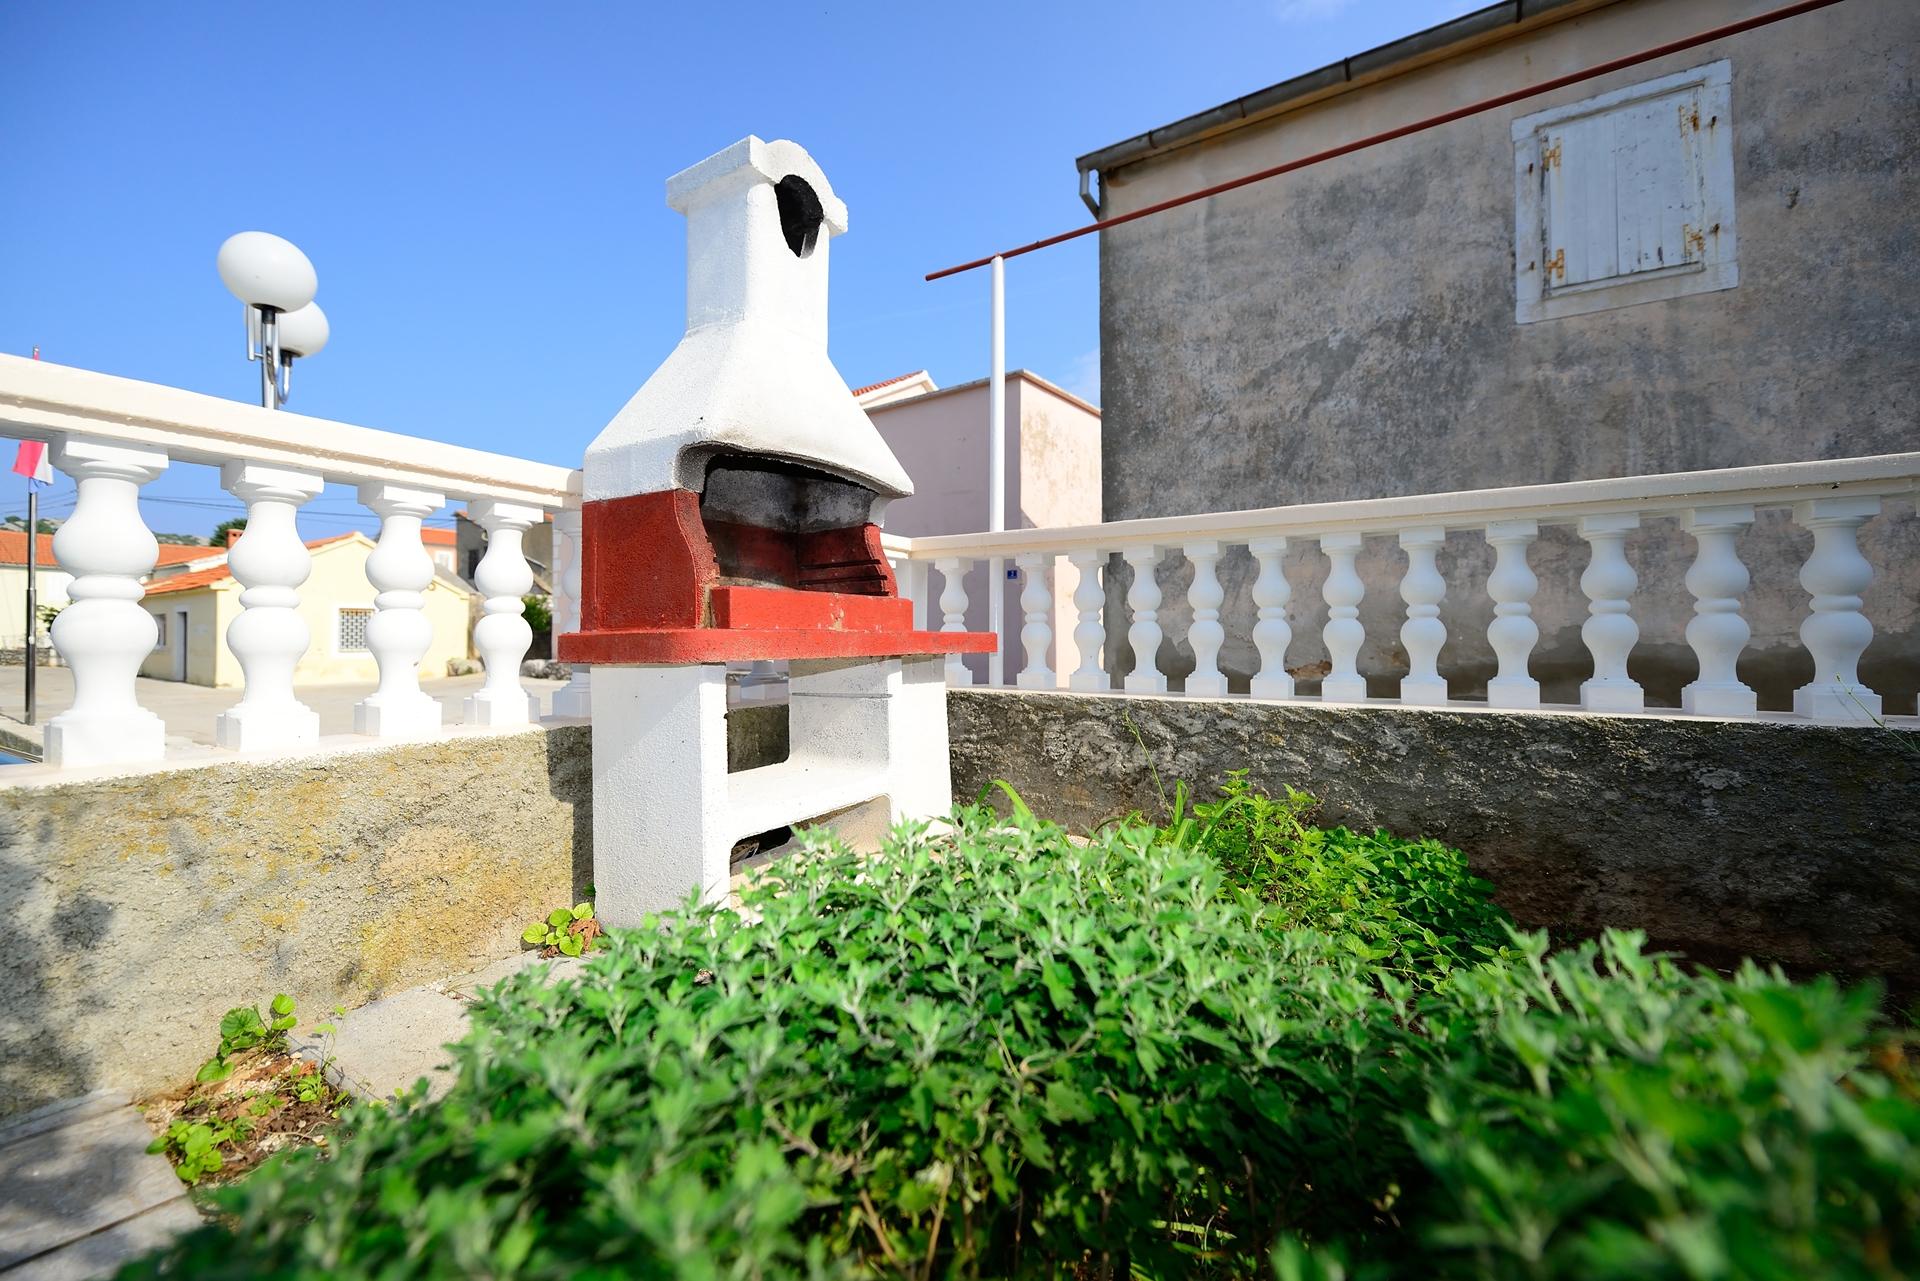 Martin - Lukoran - Vakantiehuizen, villa´s Kroatië - barbecue